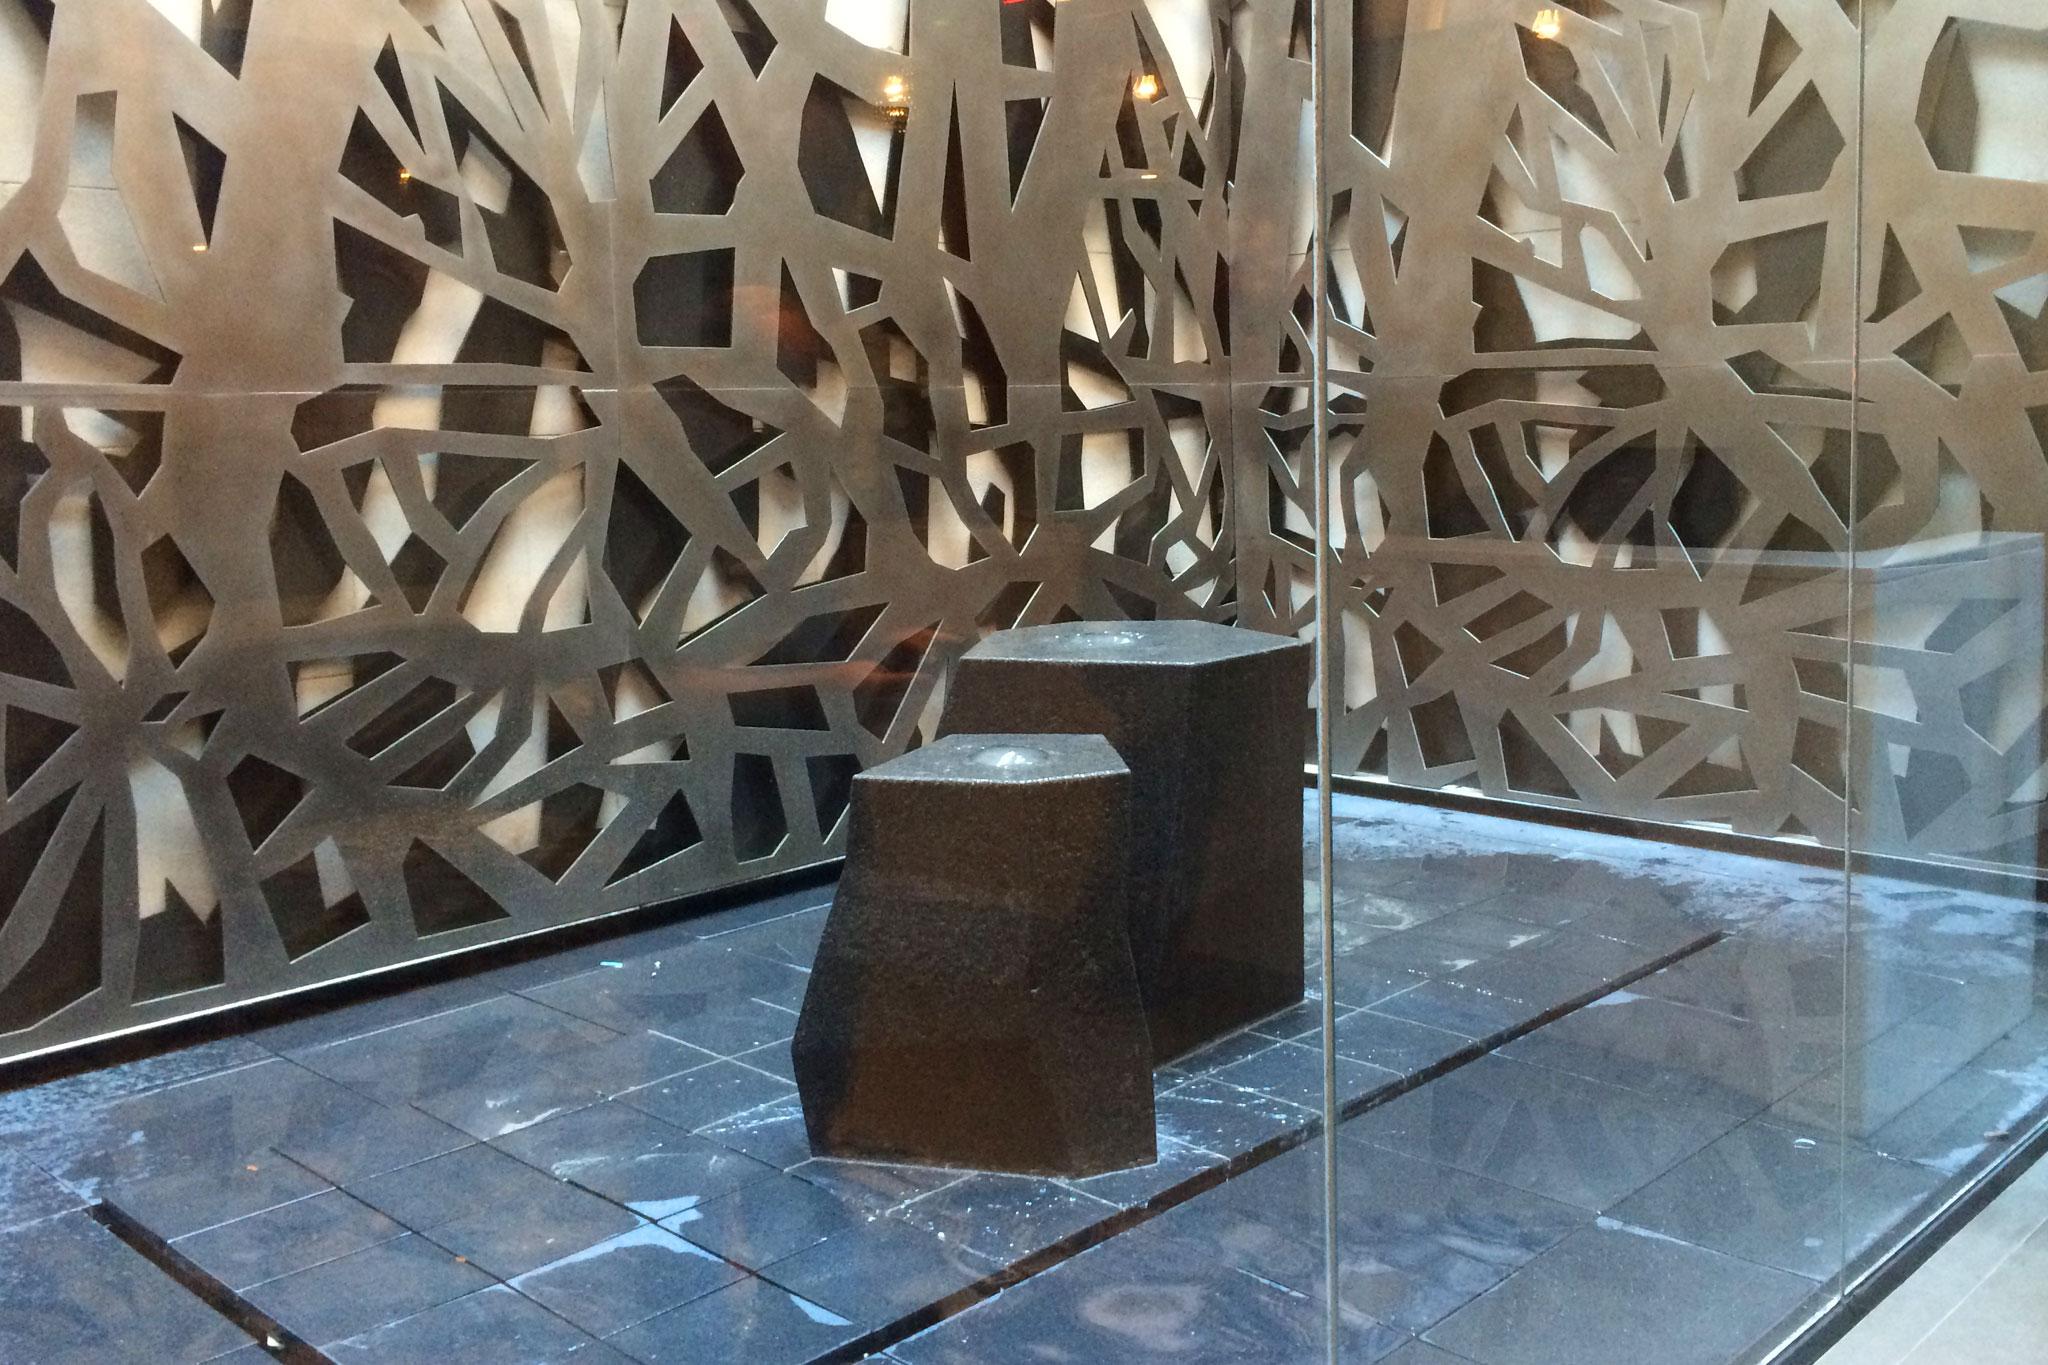 New York Atrium Water Feature